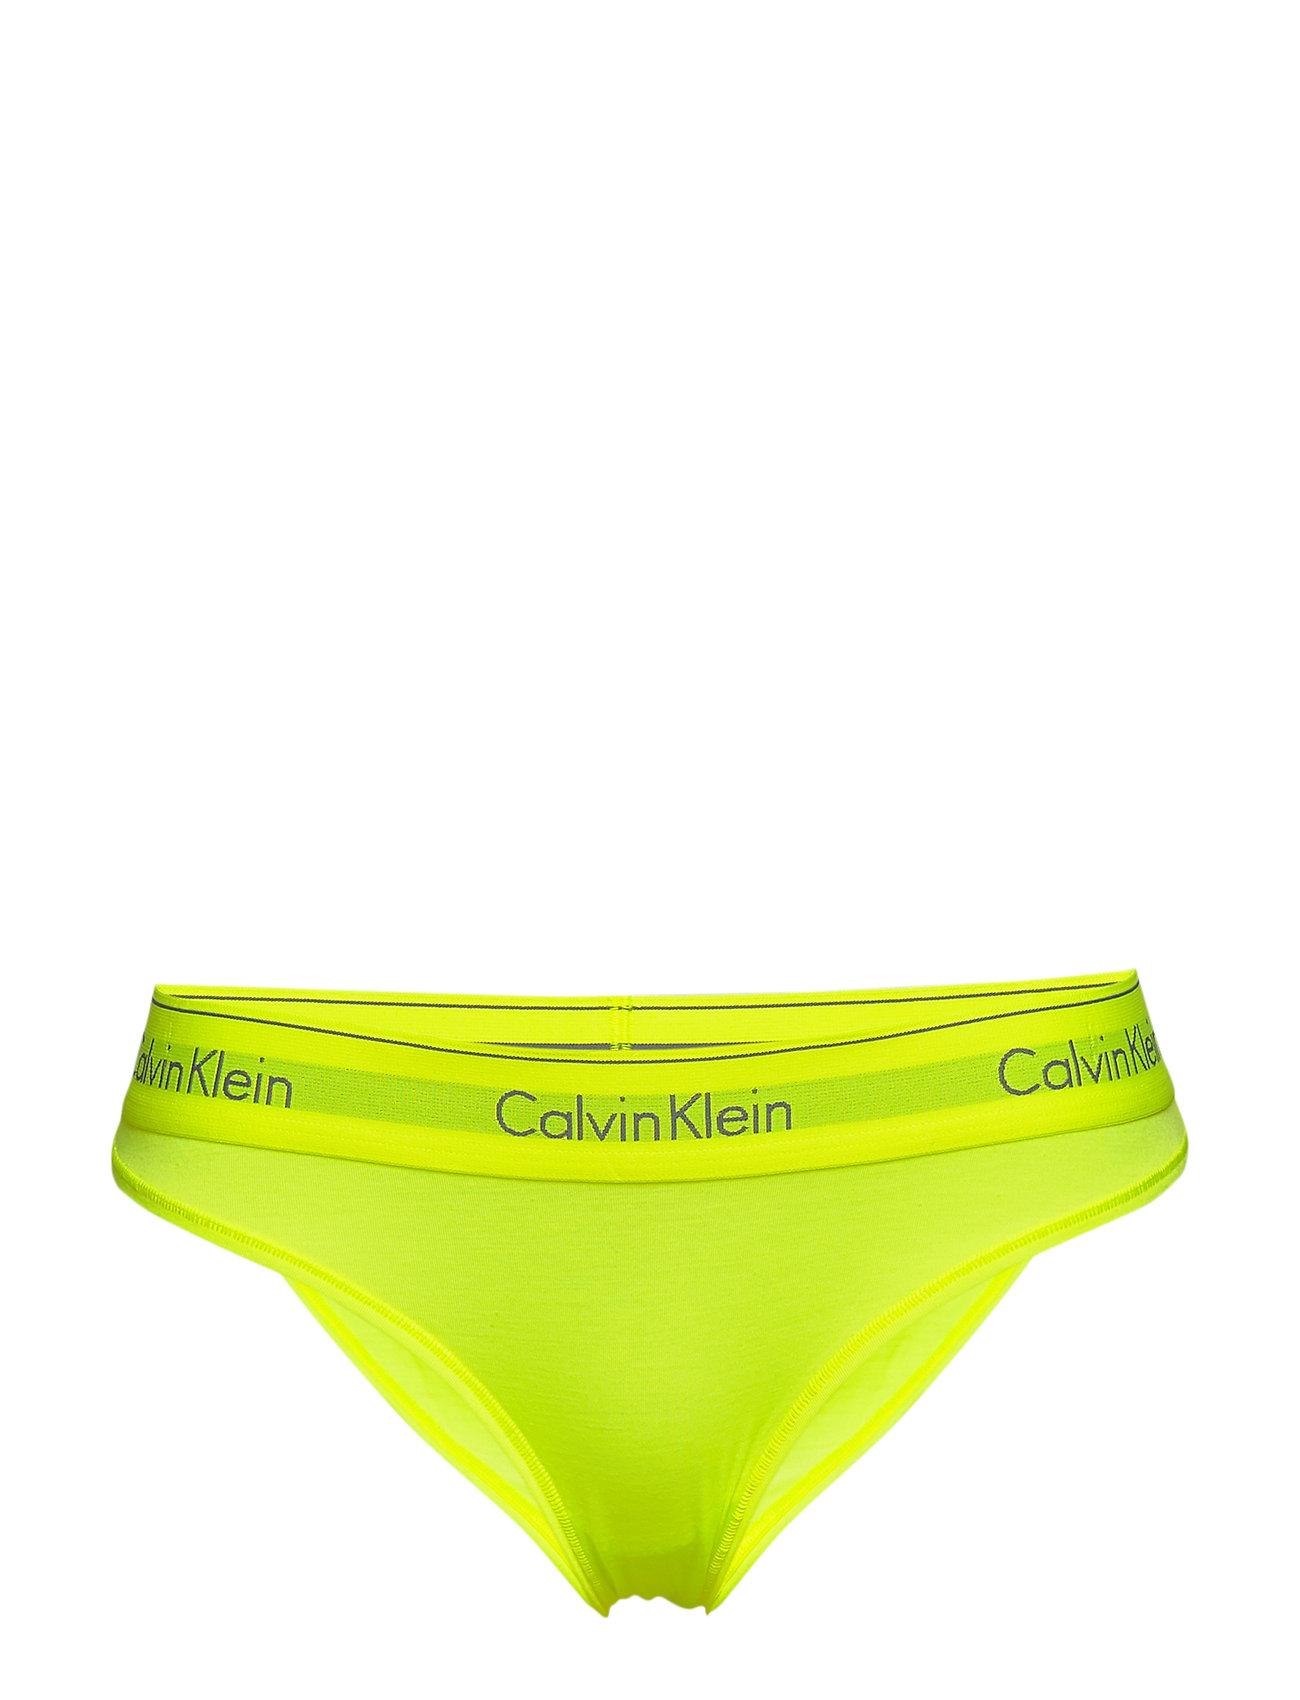 Calvin Klein BIKINI - CAUTION TAPE